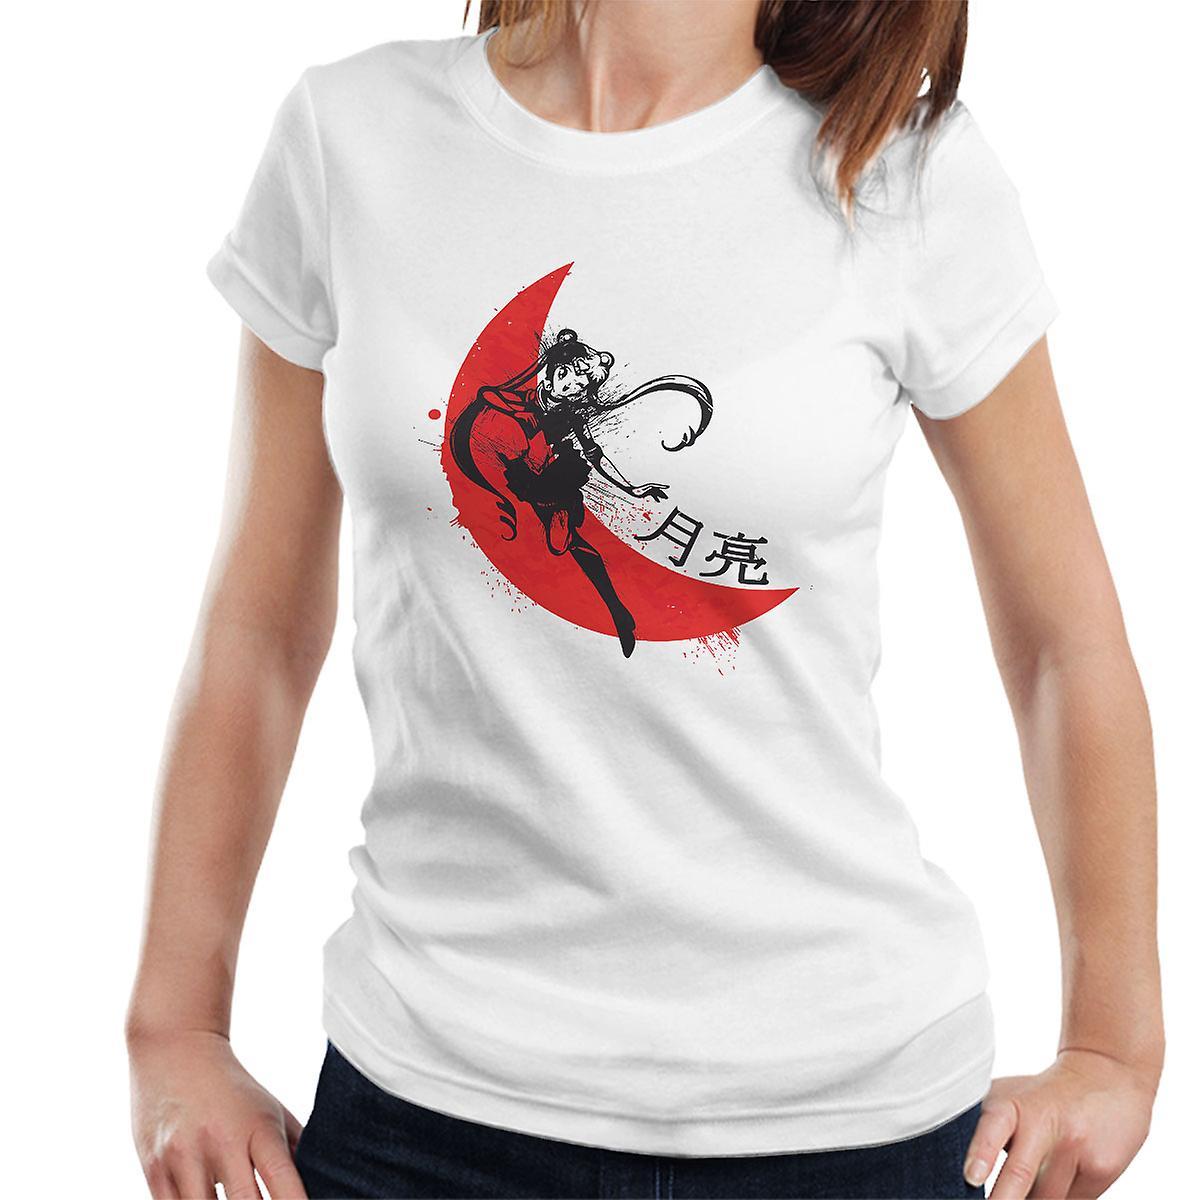 d7116d9aadcb63 Rote Sonne Sailor Moon Damen T-Shirt   Fruugo